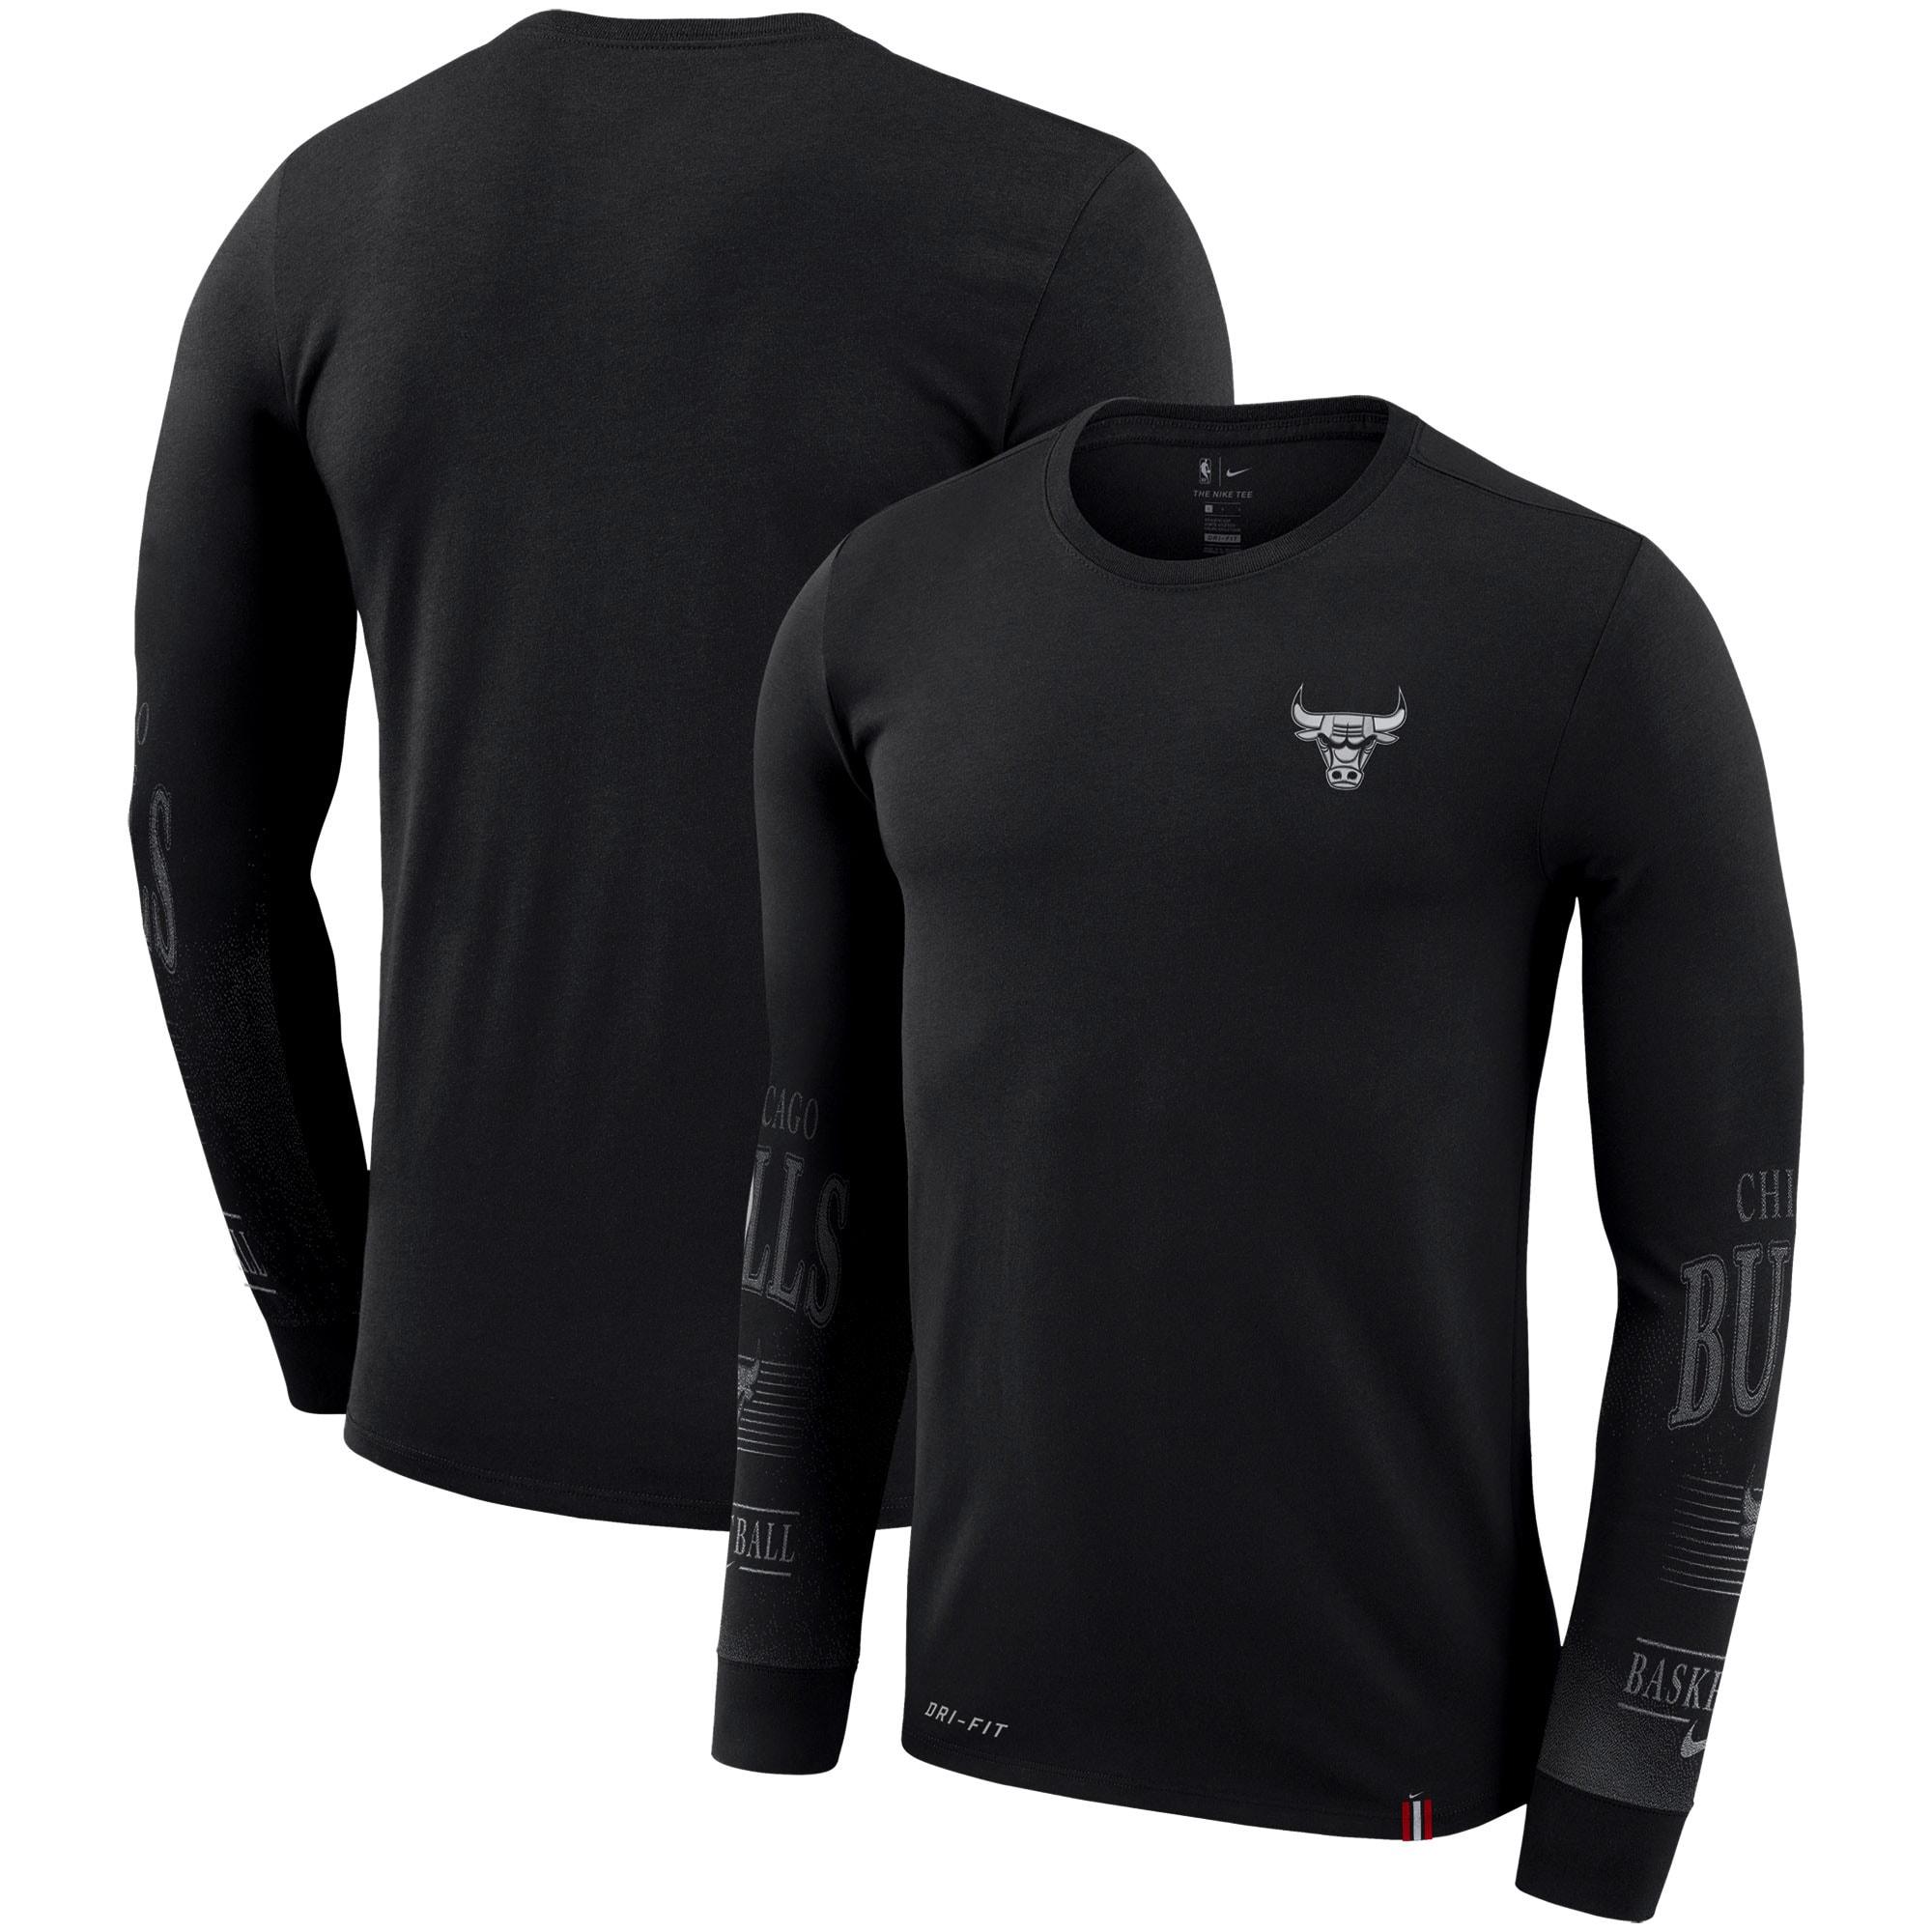 Chicago Bulls Nike Elevated Mezzo Pixel Performance Long Sleeve T-Shirt - Black